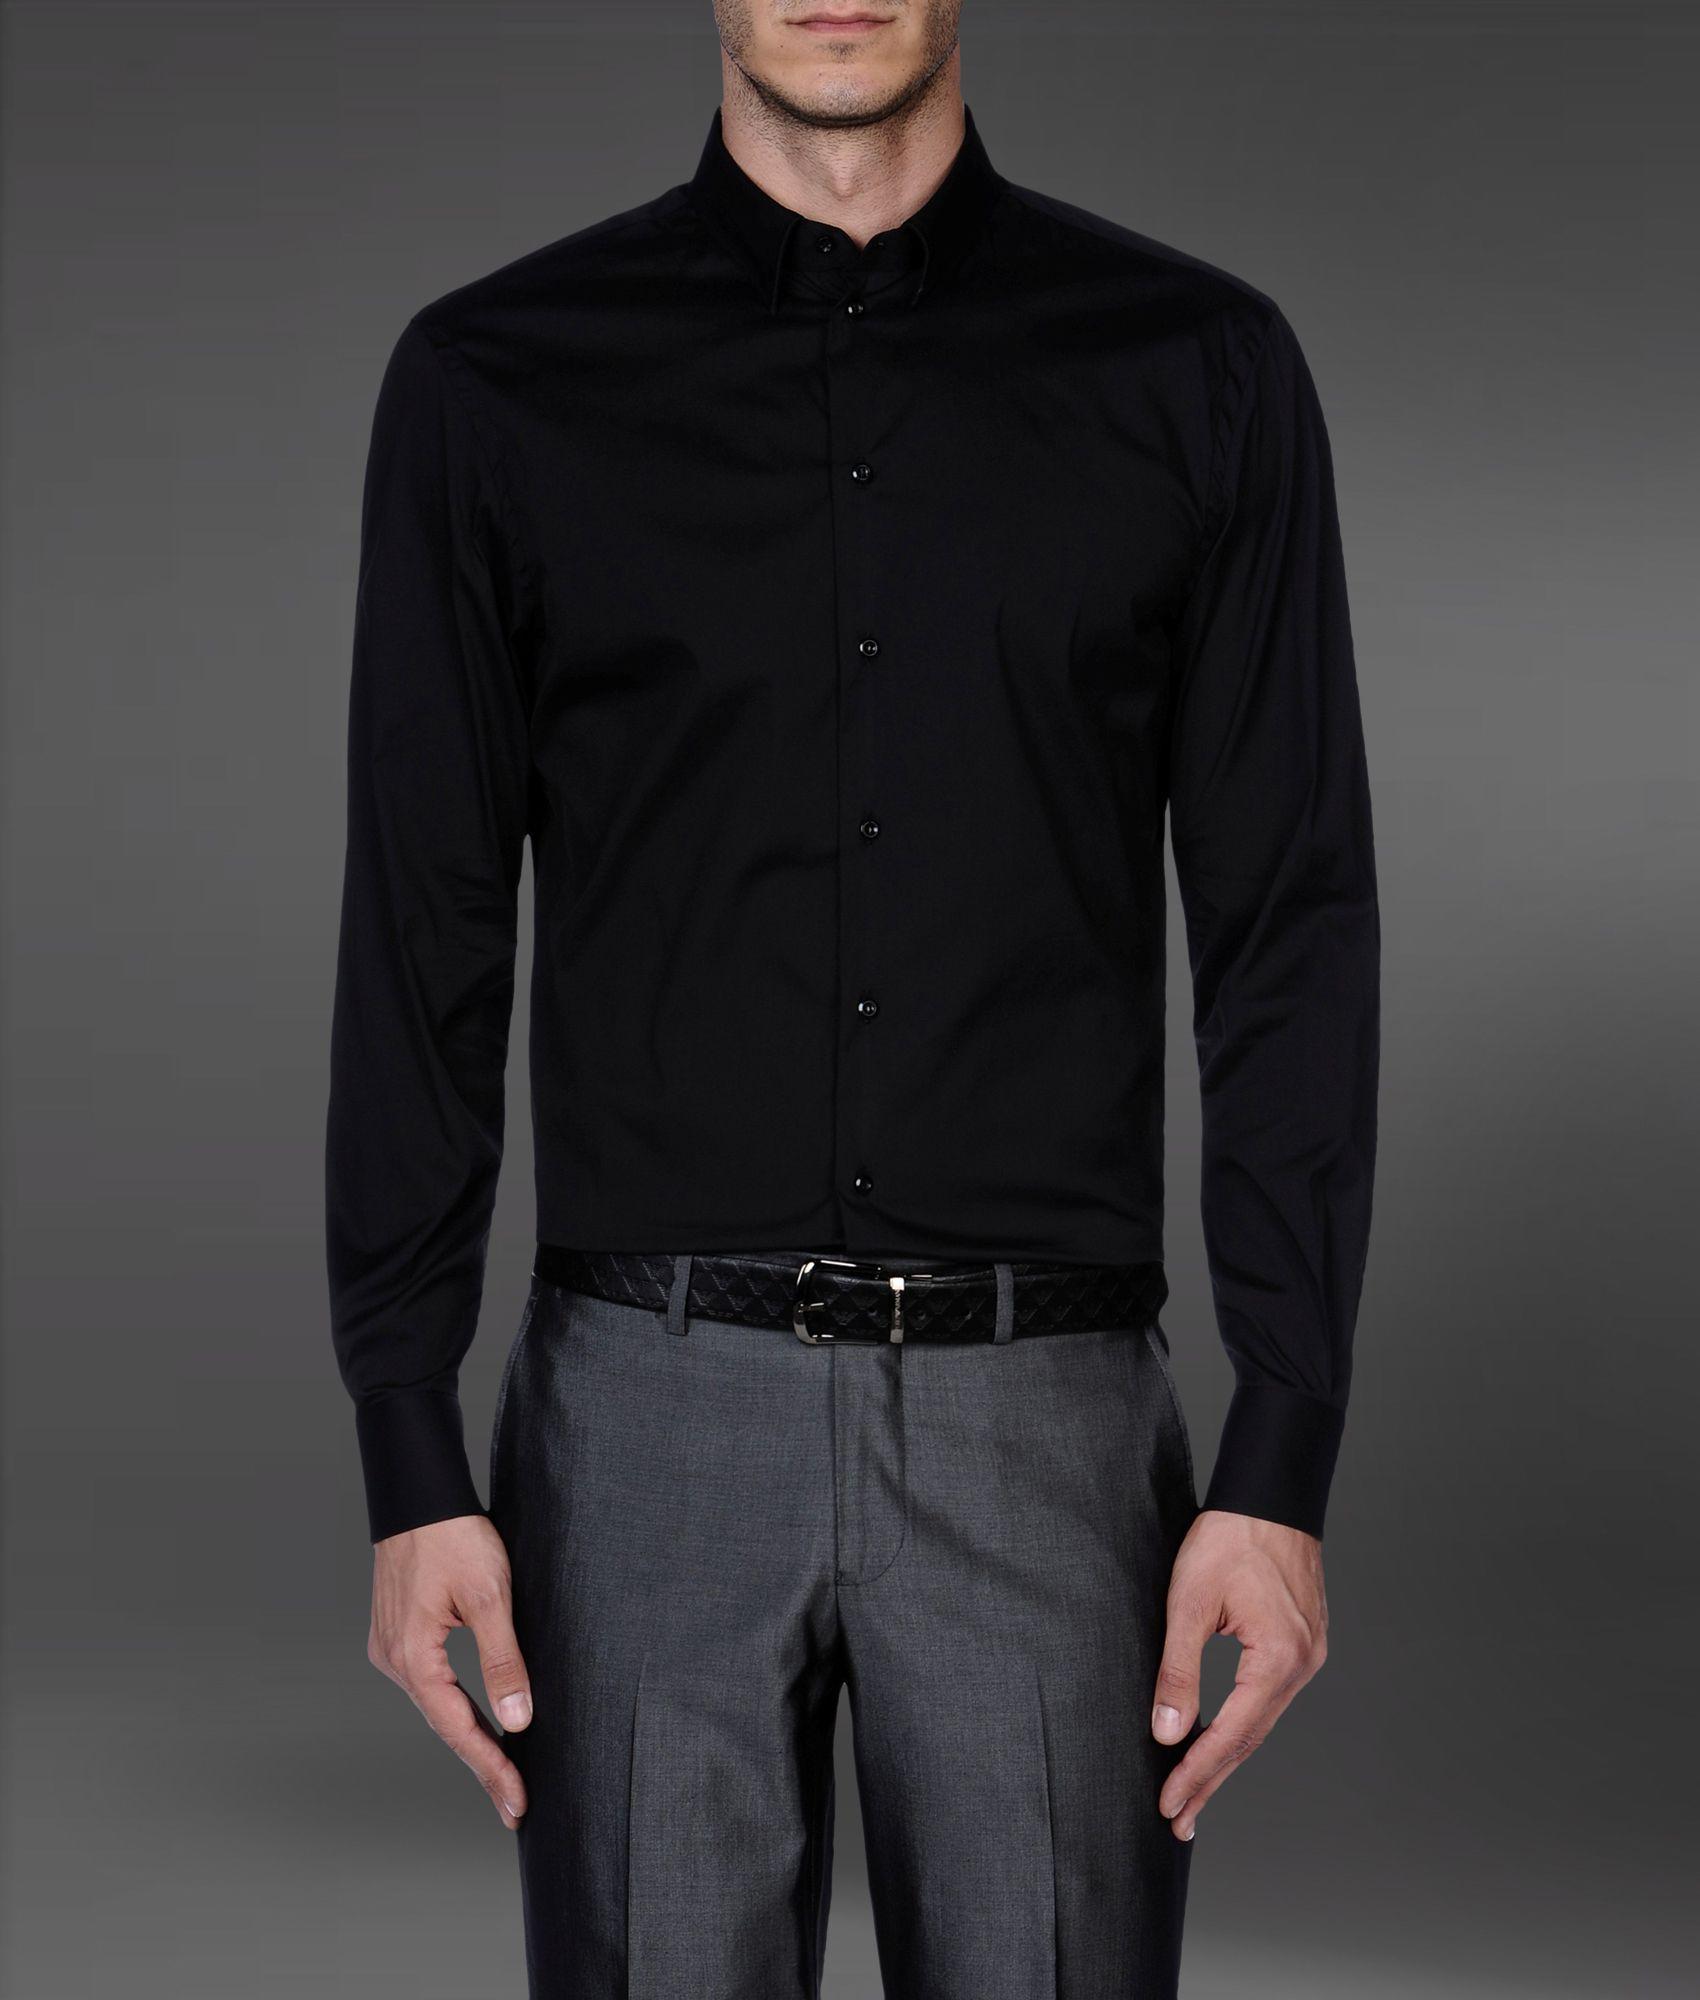 Sonderteil Weg sparen uk billig verkaufen Black Armani Shirts For Mens | Toffee Art